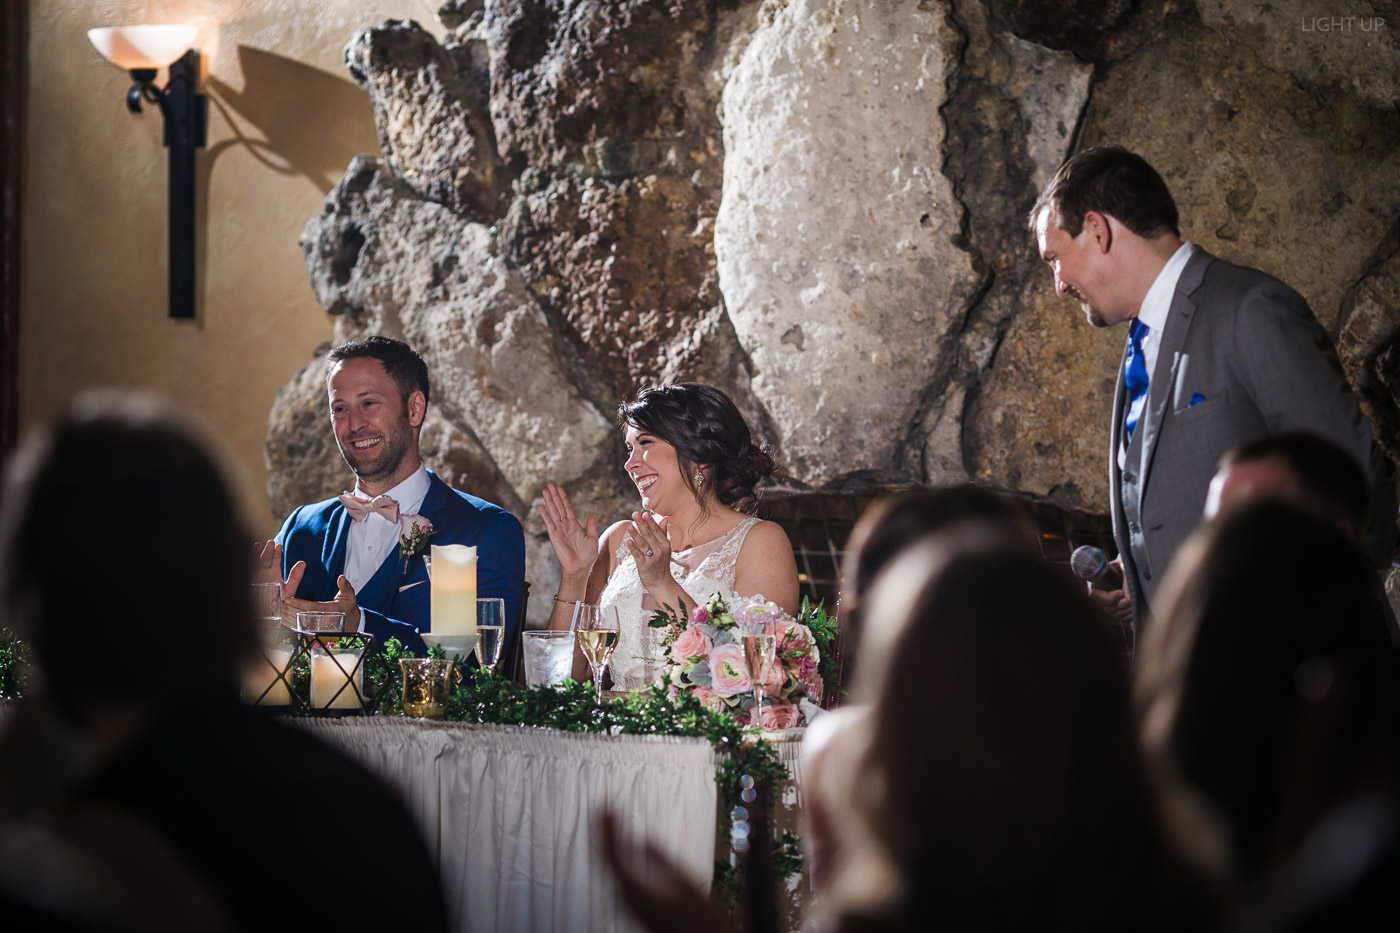 hstoric-dubsdread-wedding-orlando-49.jpg